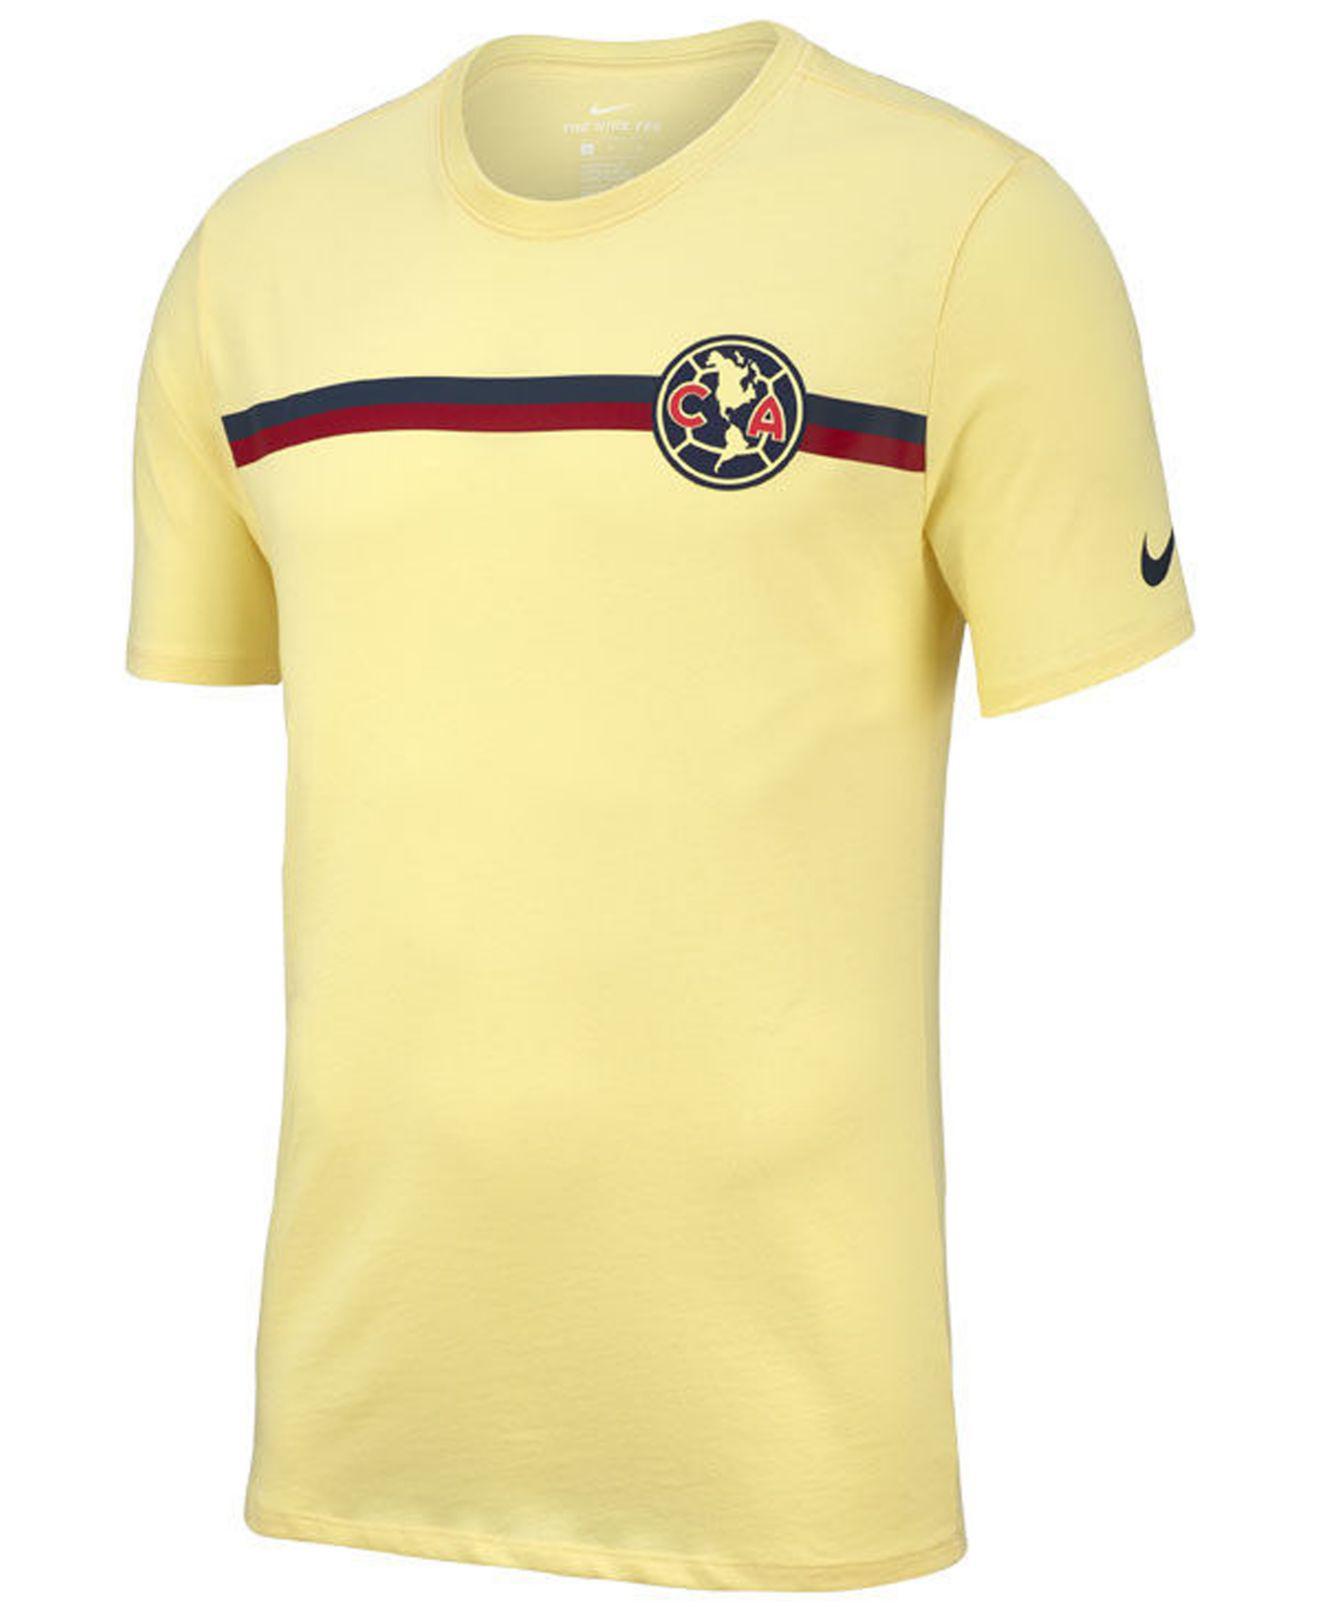 1dc4627cb89 Nike Us Mens Soccer T Shirt - Nils Stucki Kieferorthopäde